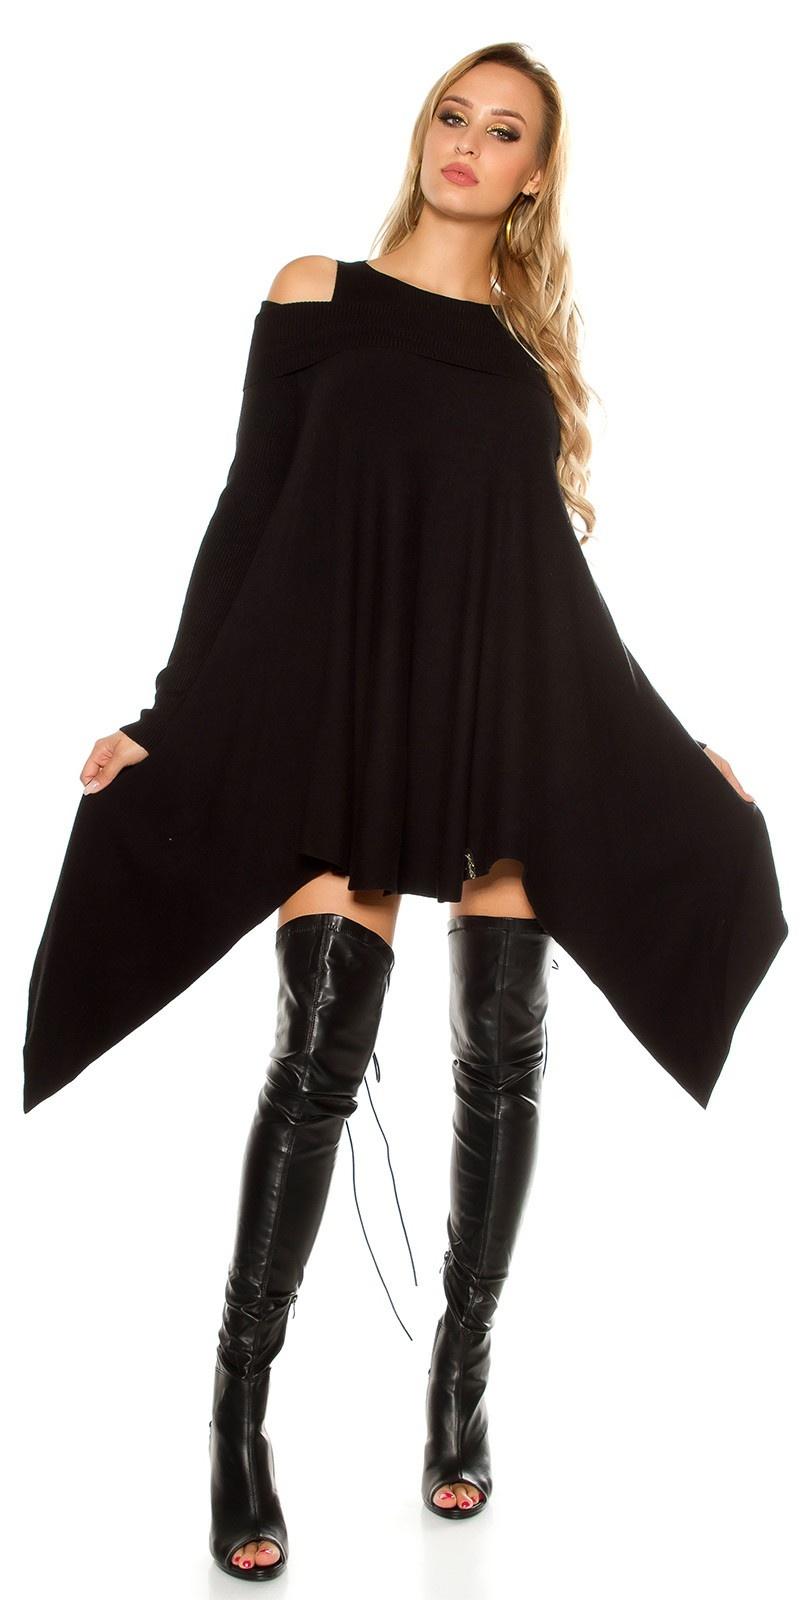 Sexy fijn gebreid mini jurkje asymmetrisch zwart